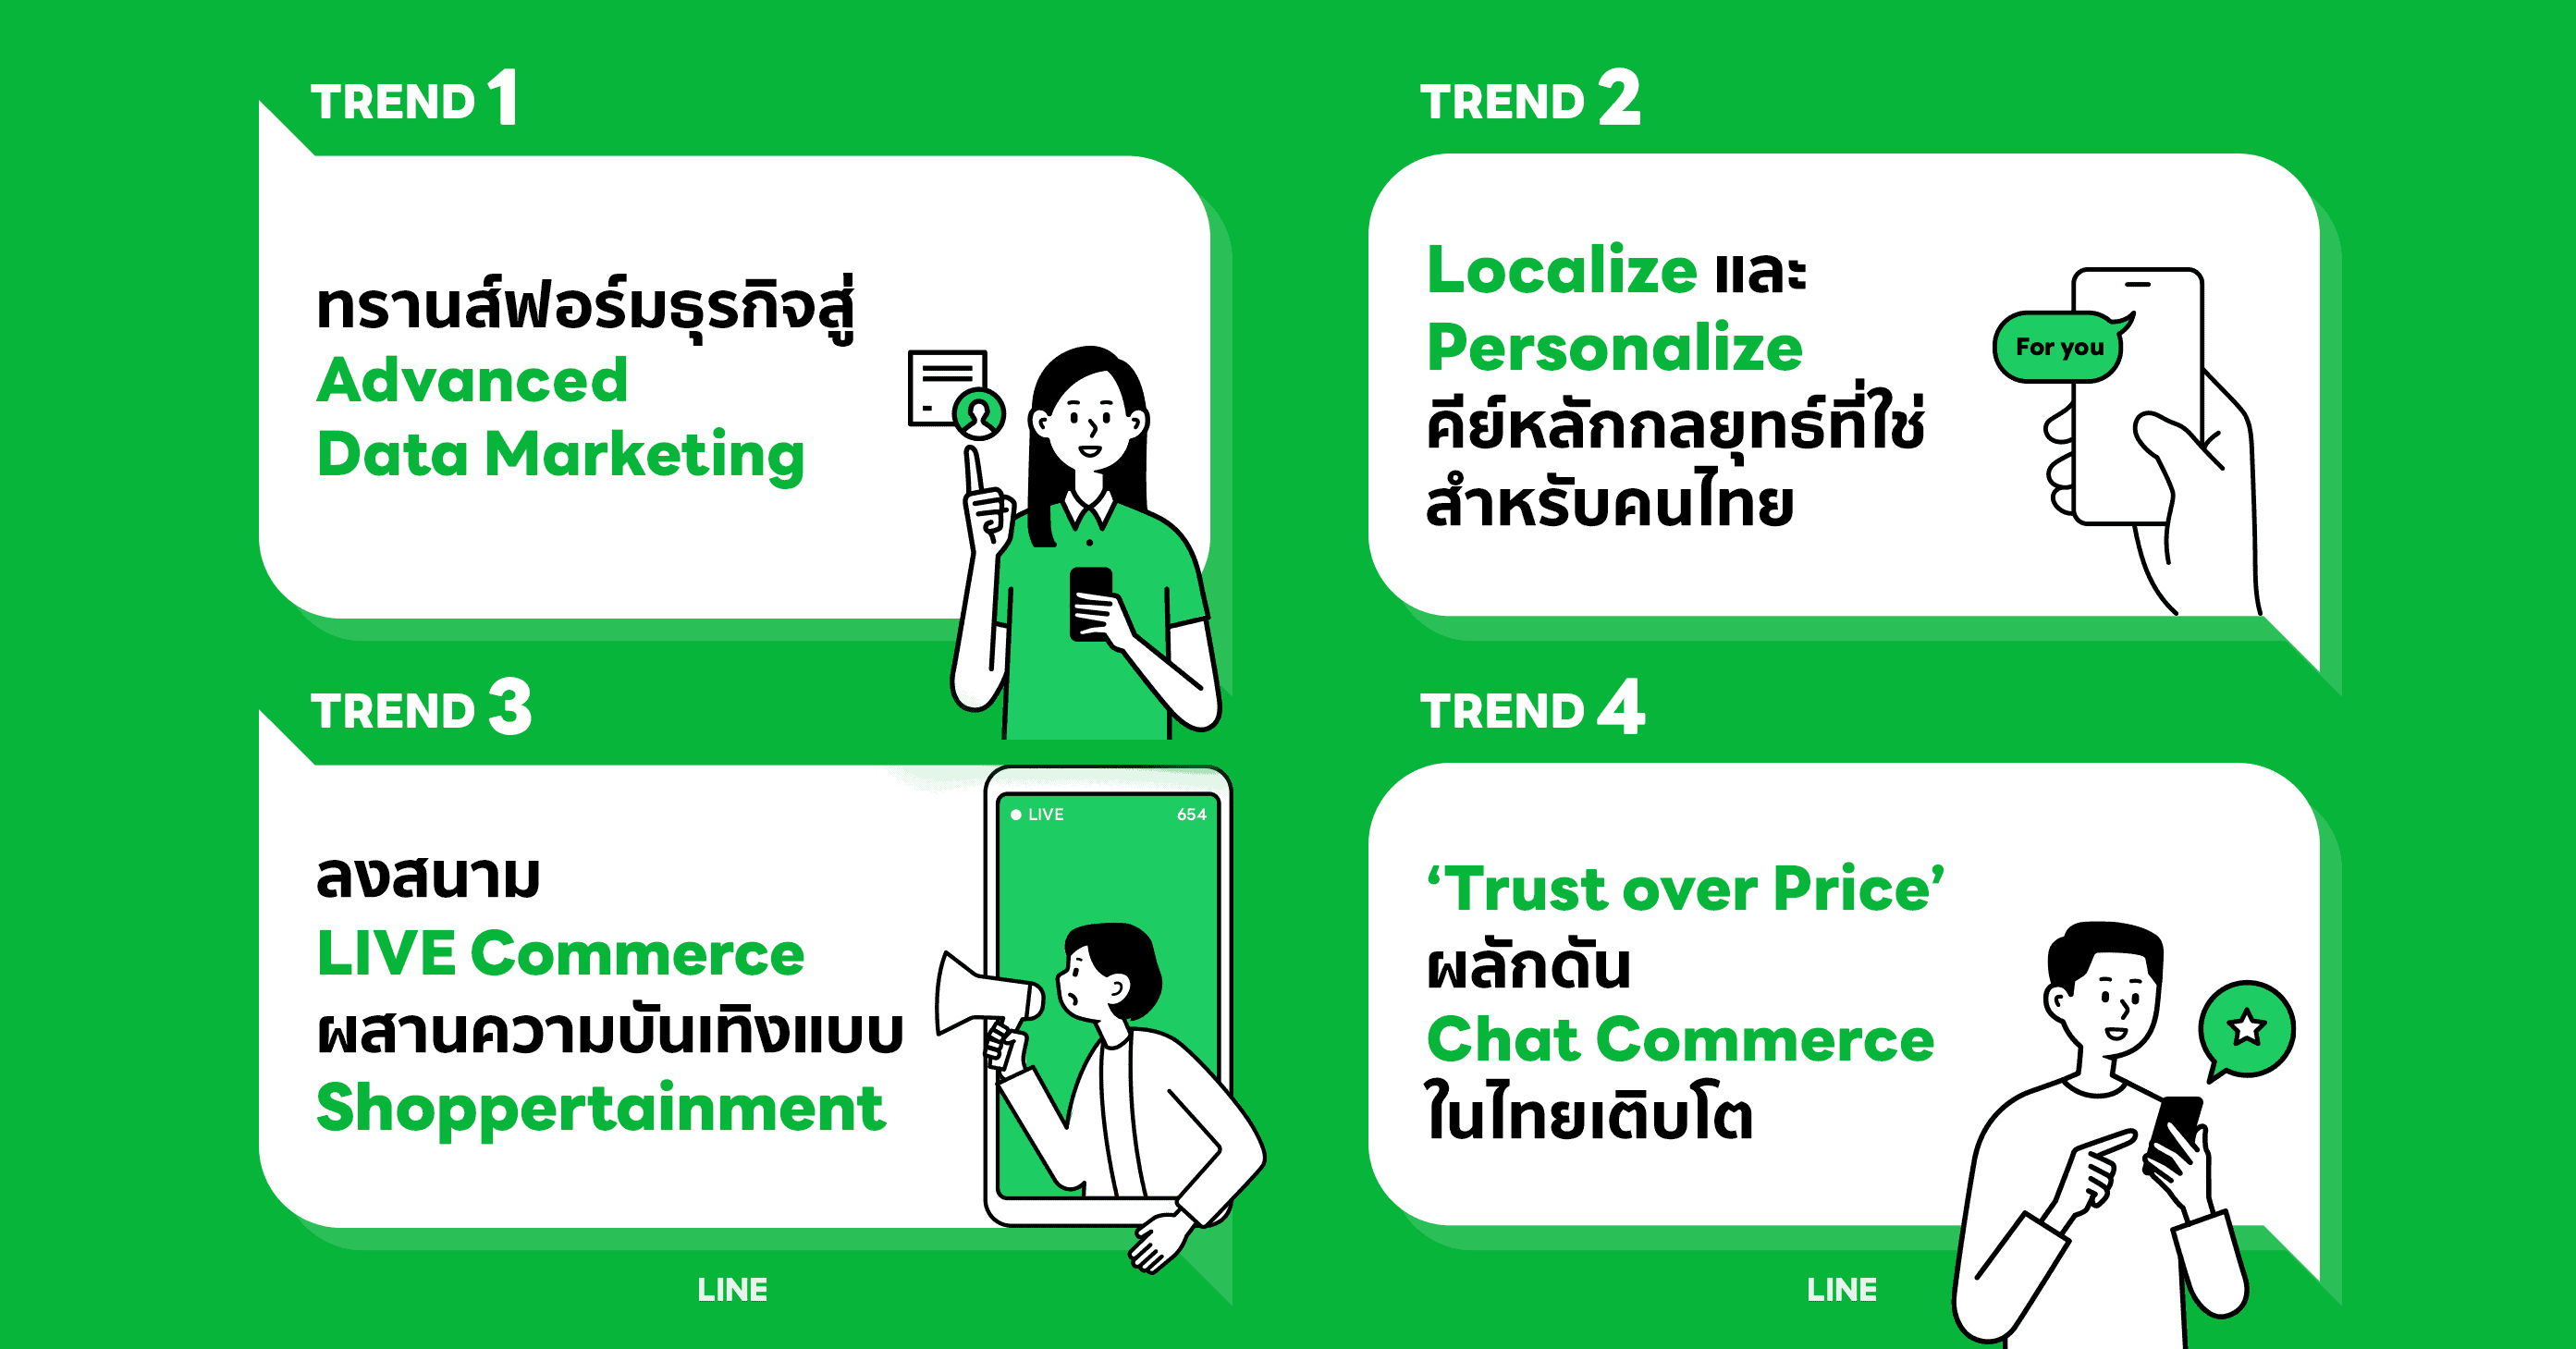 LINE เผย 4 เทรนด์ธุรกิจยุค Data-Driven Marketing เพิ่มยอดขายด้วย Personalization